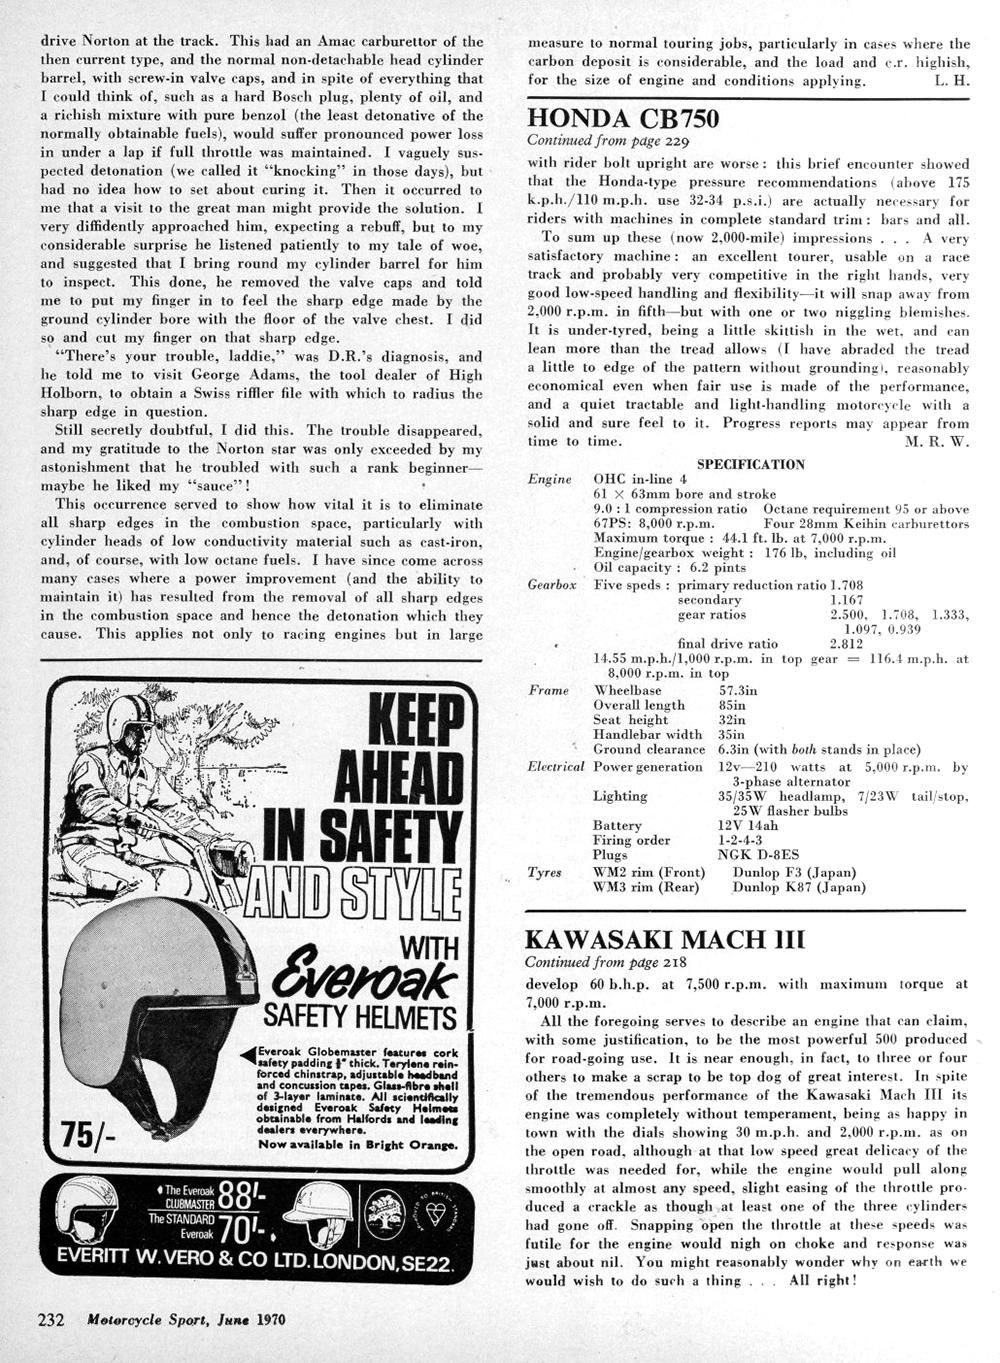 1970 Kawasaki 500 Mach 3 road test 6.jpg